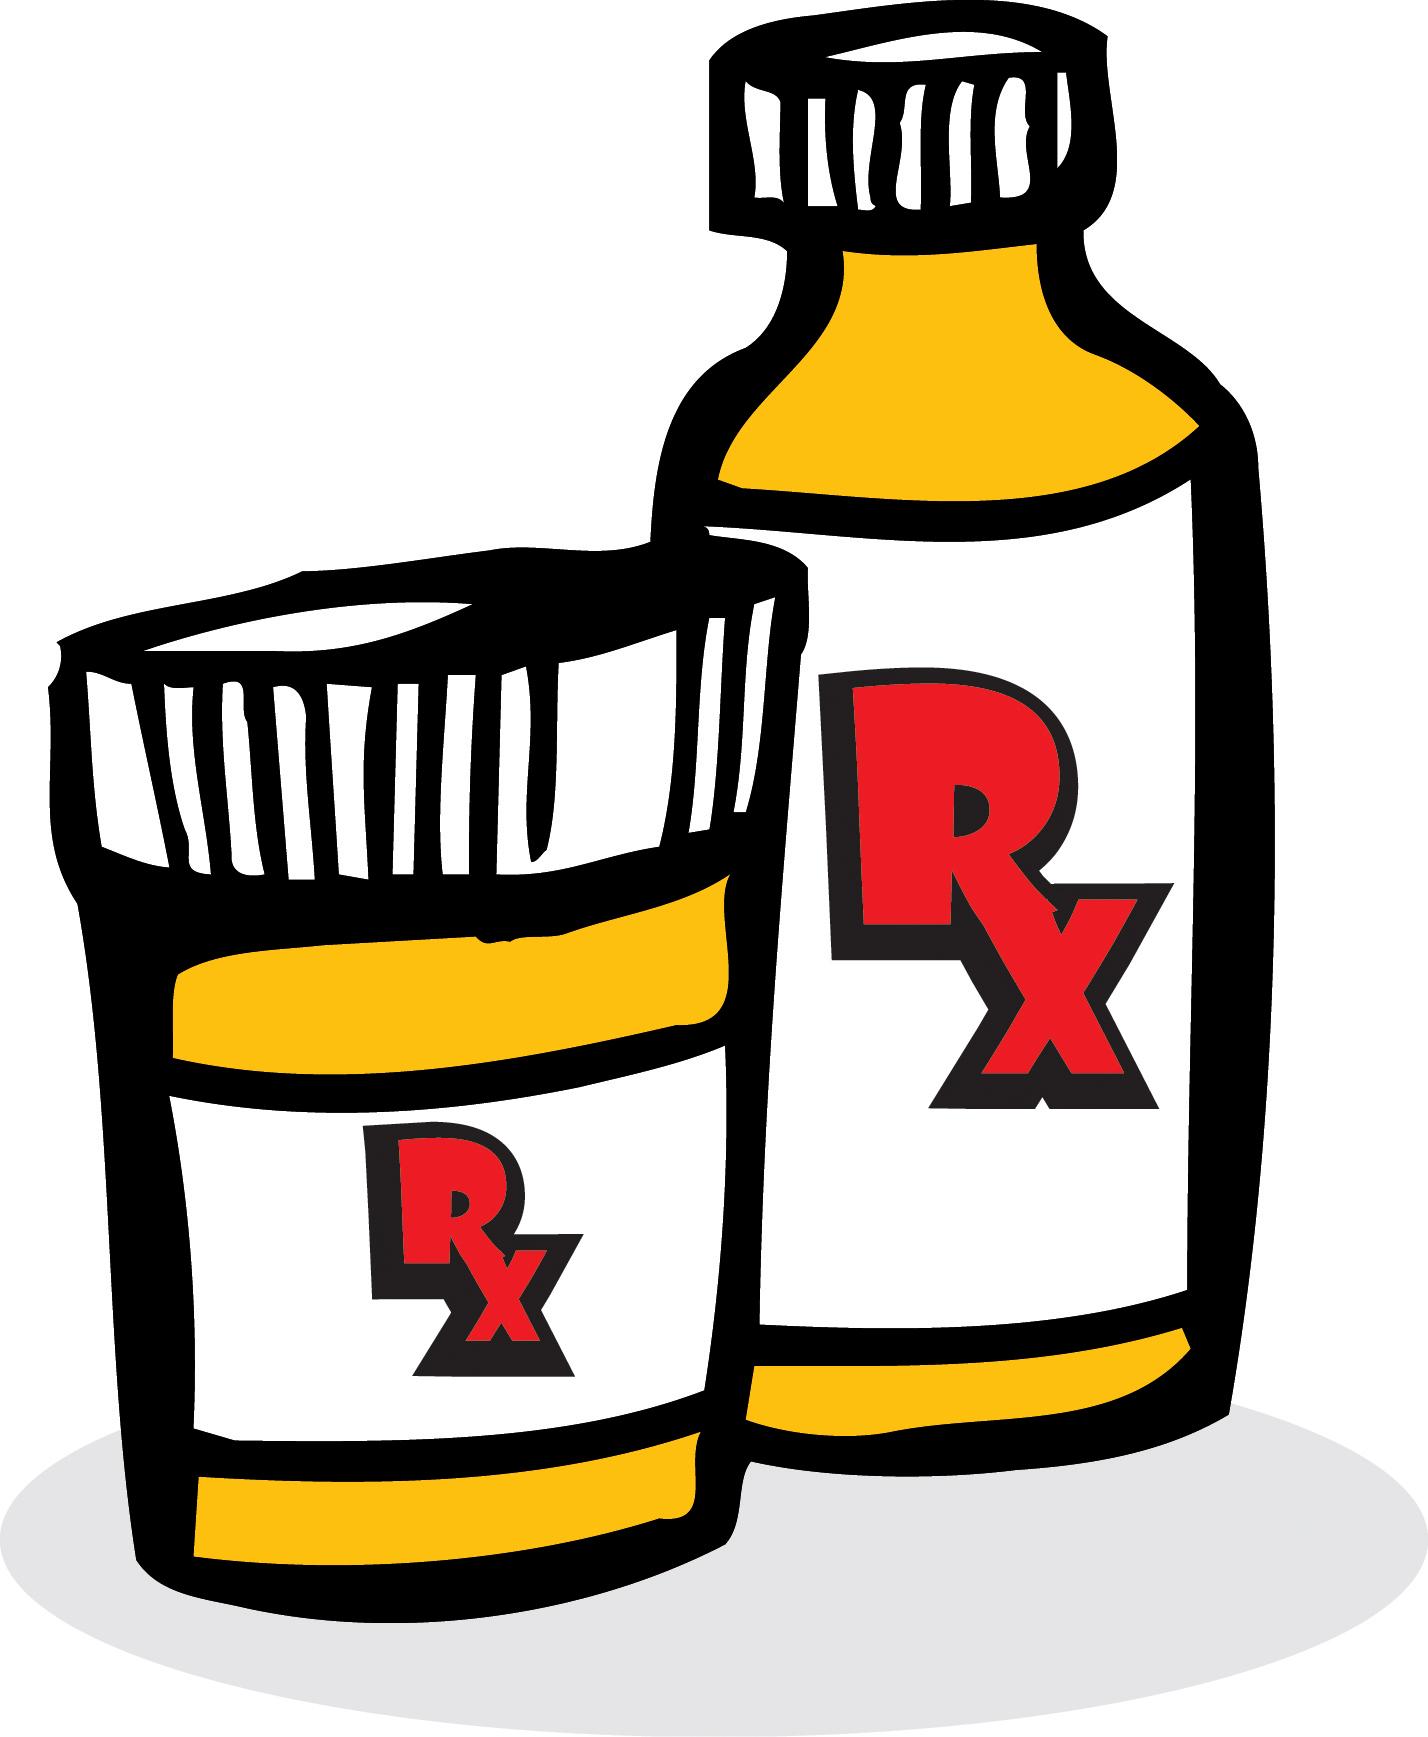 Pill Bottle Clipart & Pill Bottle Clip Art Images.